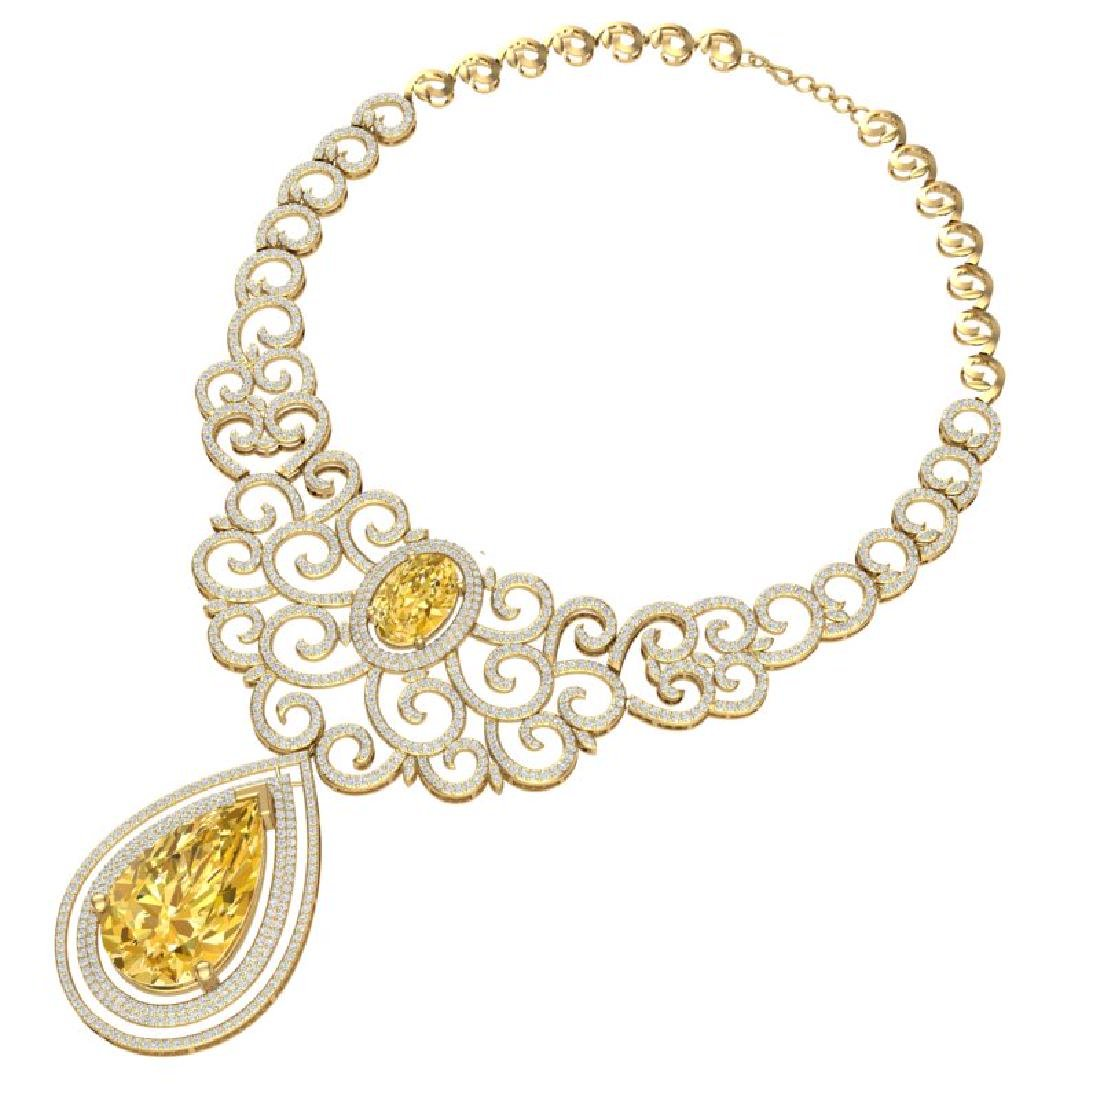 73.43 CTW Royalty Canary Citrine & VS Diamond Necklace - 3